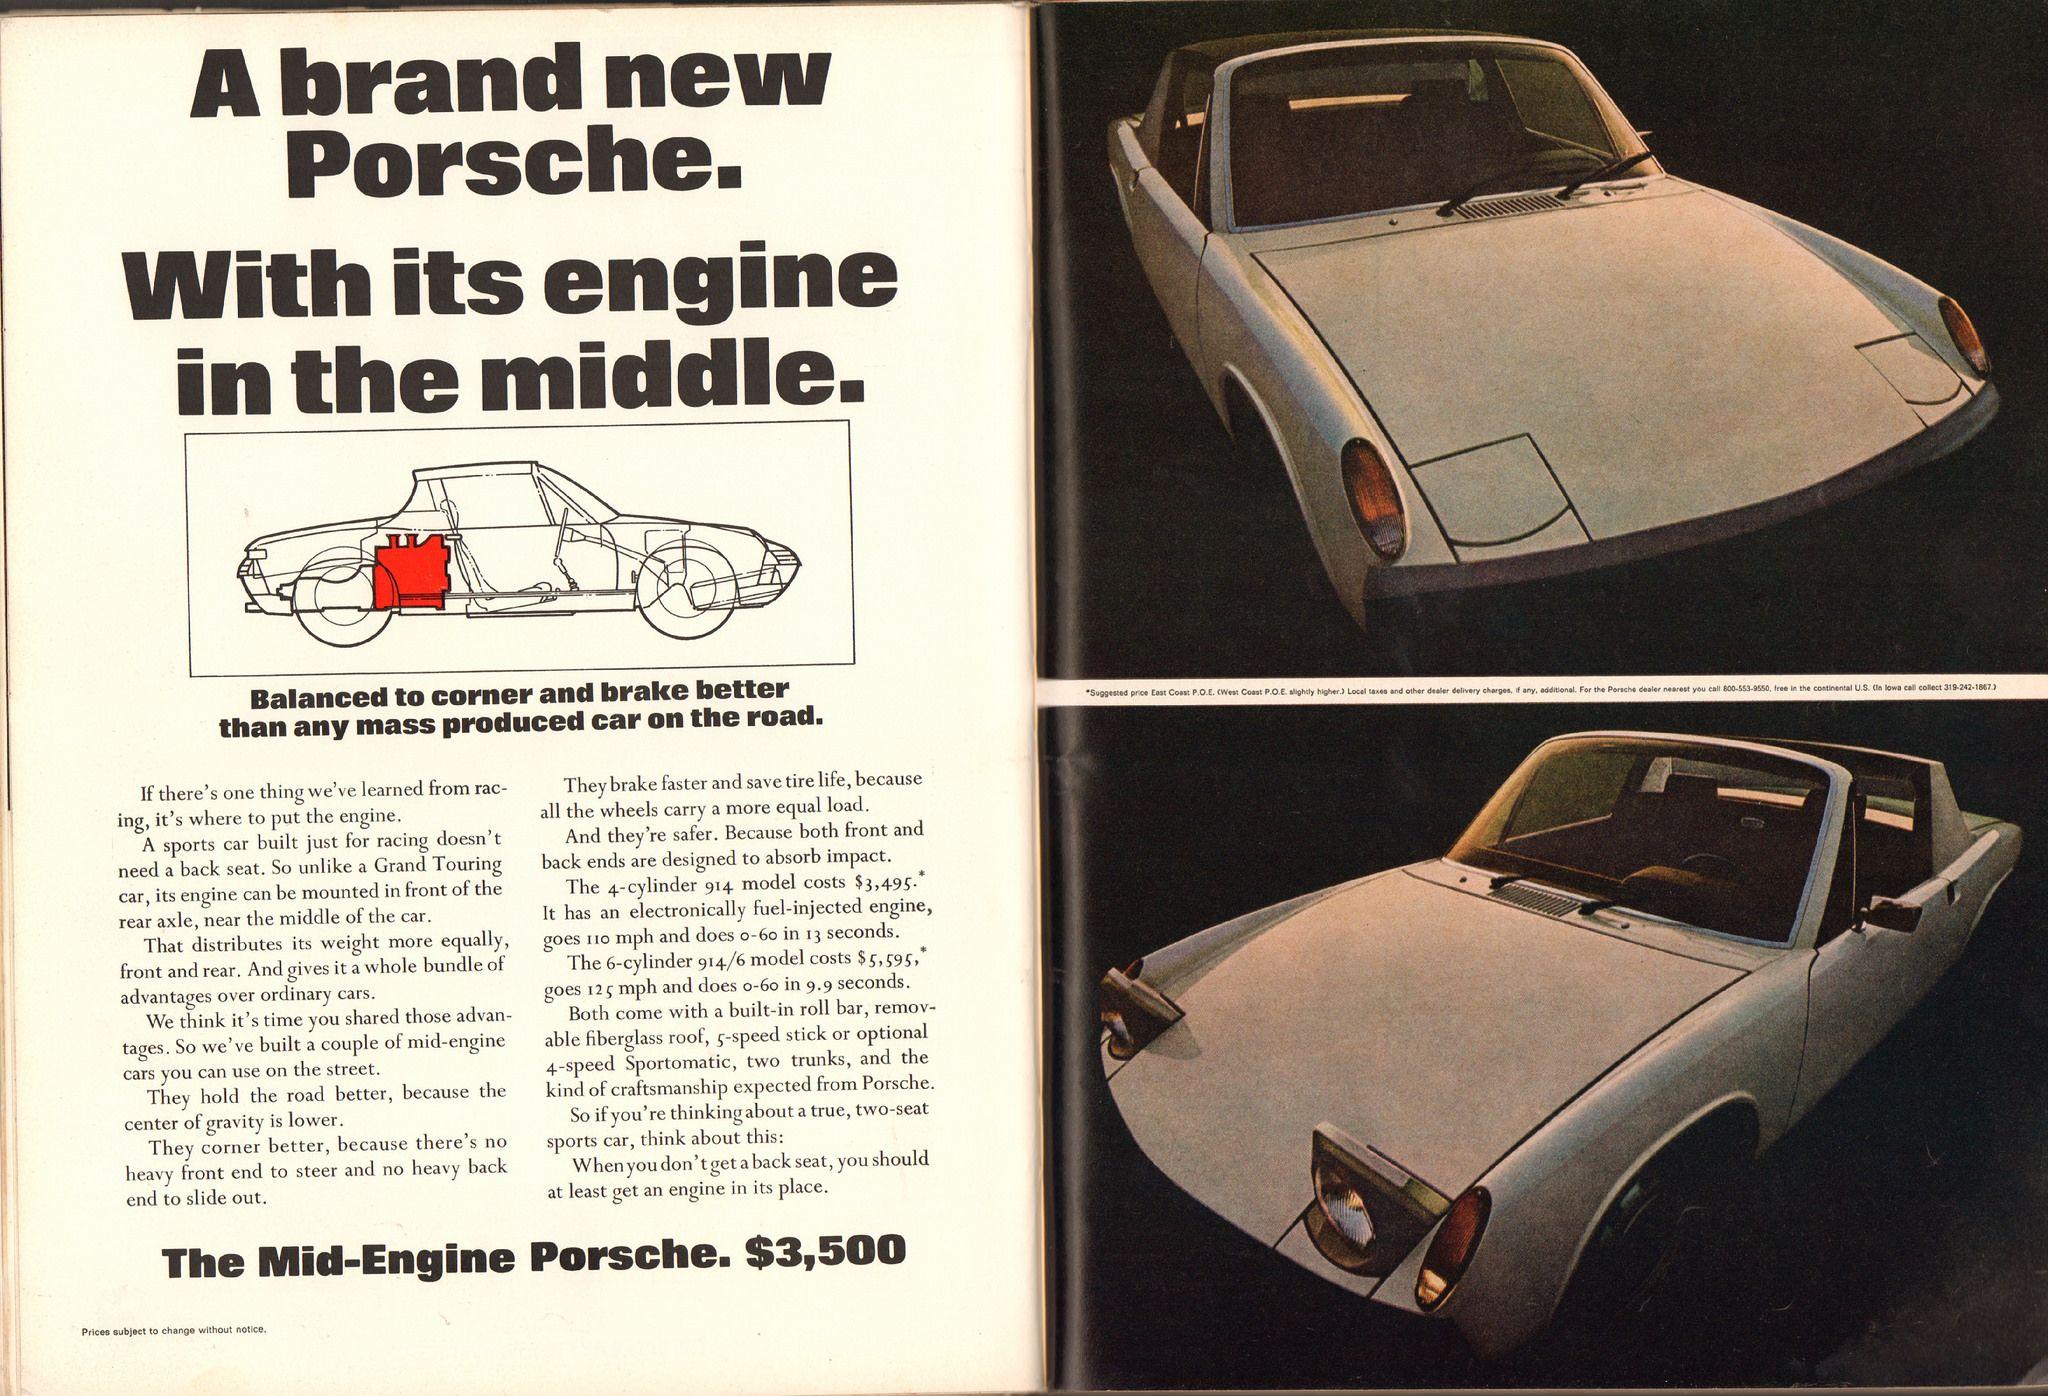 1970 Porshe 914 Advertisement Playboy December 1969 Porsche 914